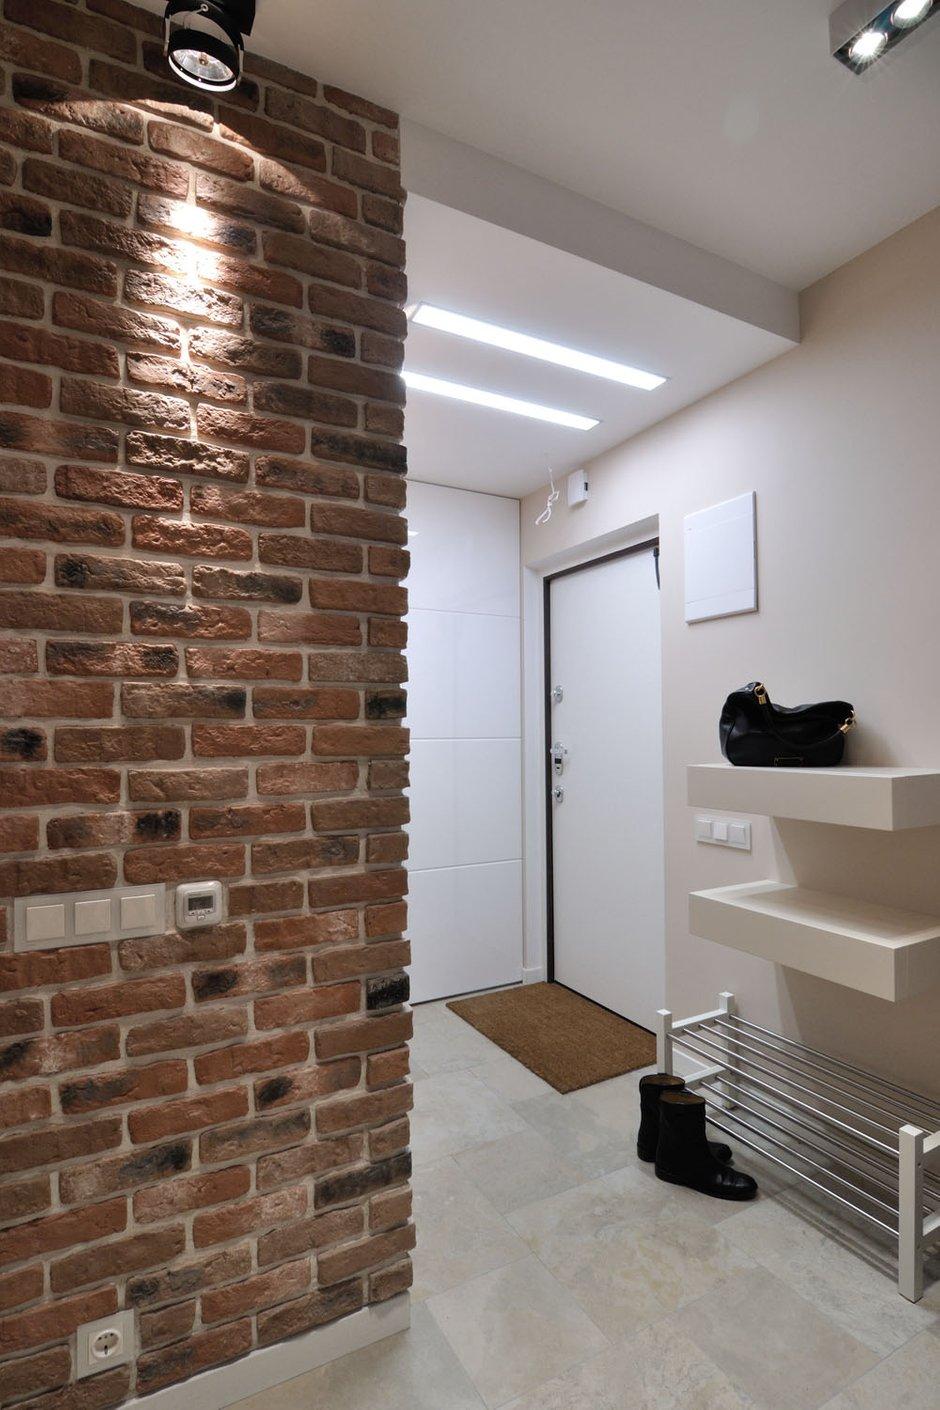 Фотография: Прихожая в стиле Лофт, Квартира, Дома и квартиры, Проект недели – фото на INMYROOM